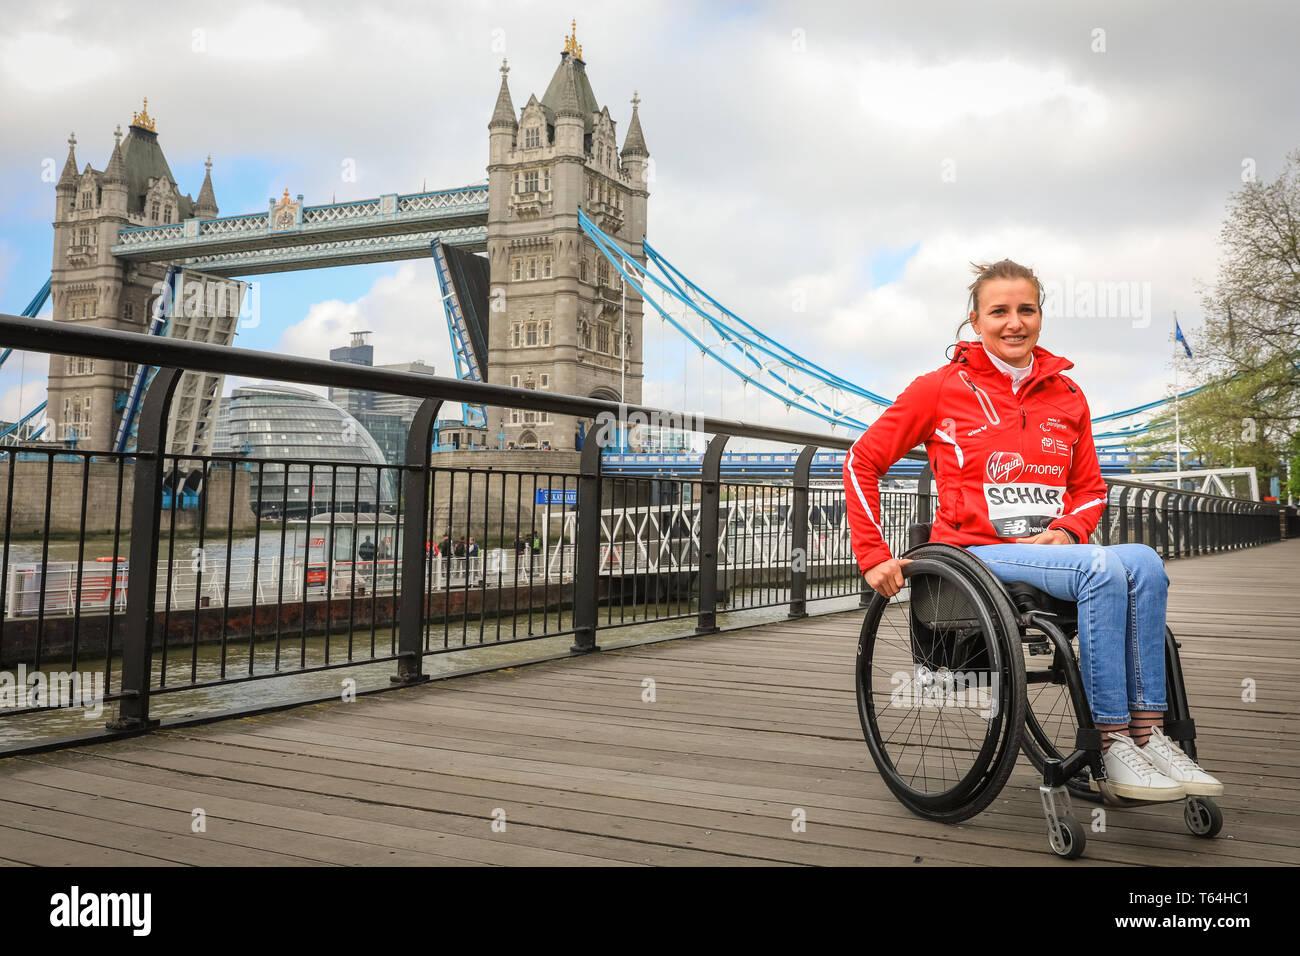 London, UK, 29th April 2019. Switzerland's Manuela Schar won the women's wheelchair race.The Elite Race winners of the 2019 Virgin London Marathon pose for photographers near Tower Bridge in London. Credit: Imageplotter/Alamy Live News Stock Photo